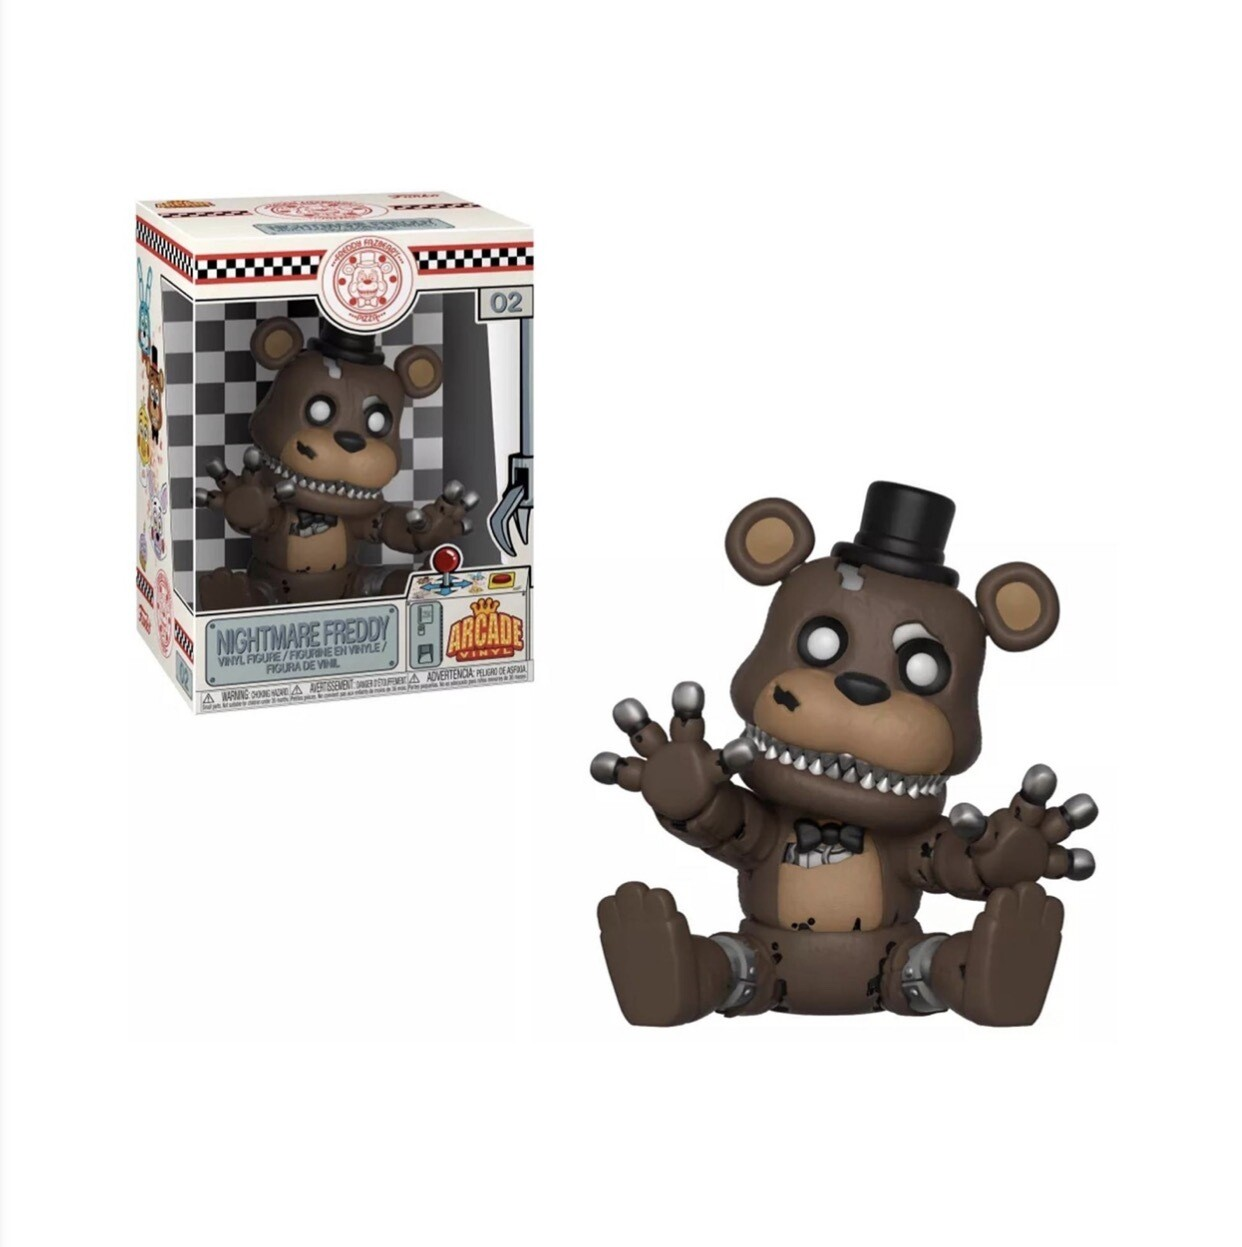 Funko Five Nights at Freddy's Figure Nightmare Freddy